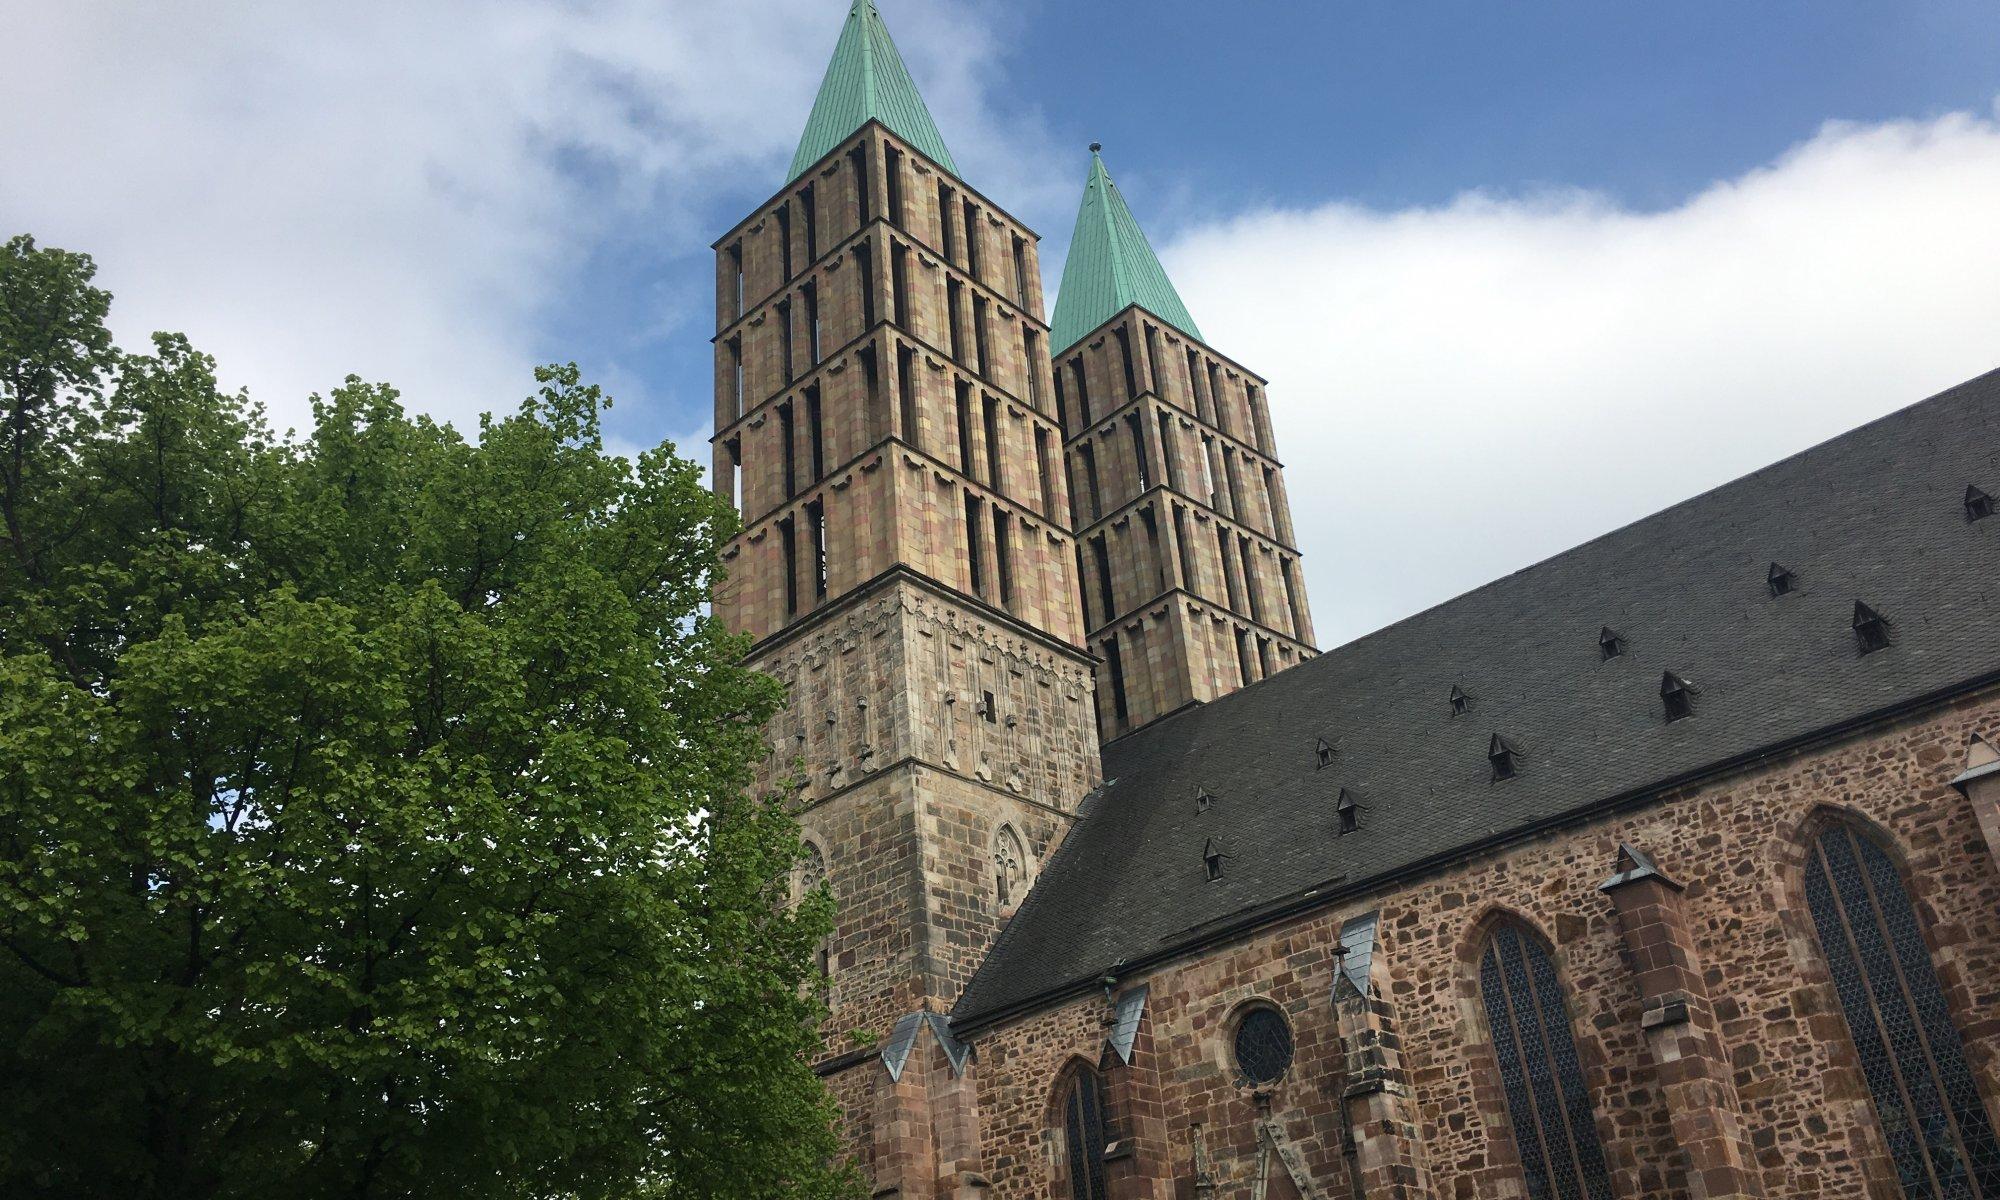 St. Martin, Kassel